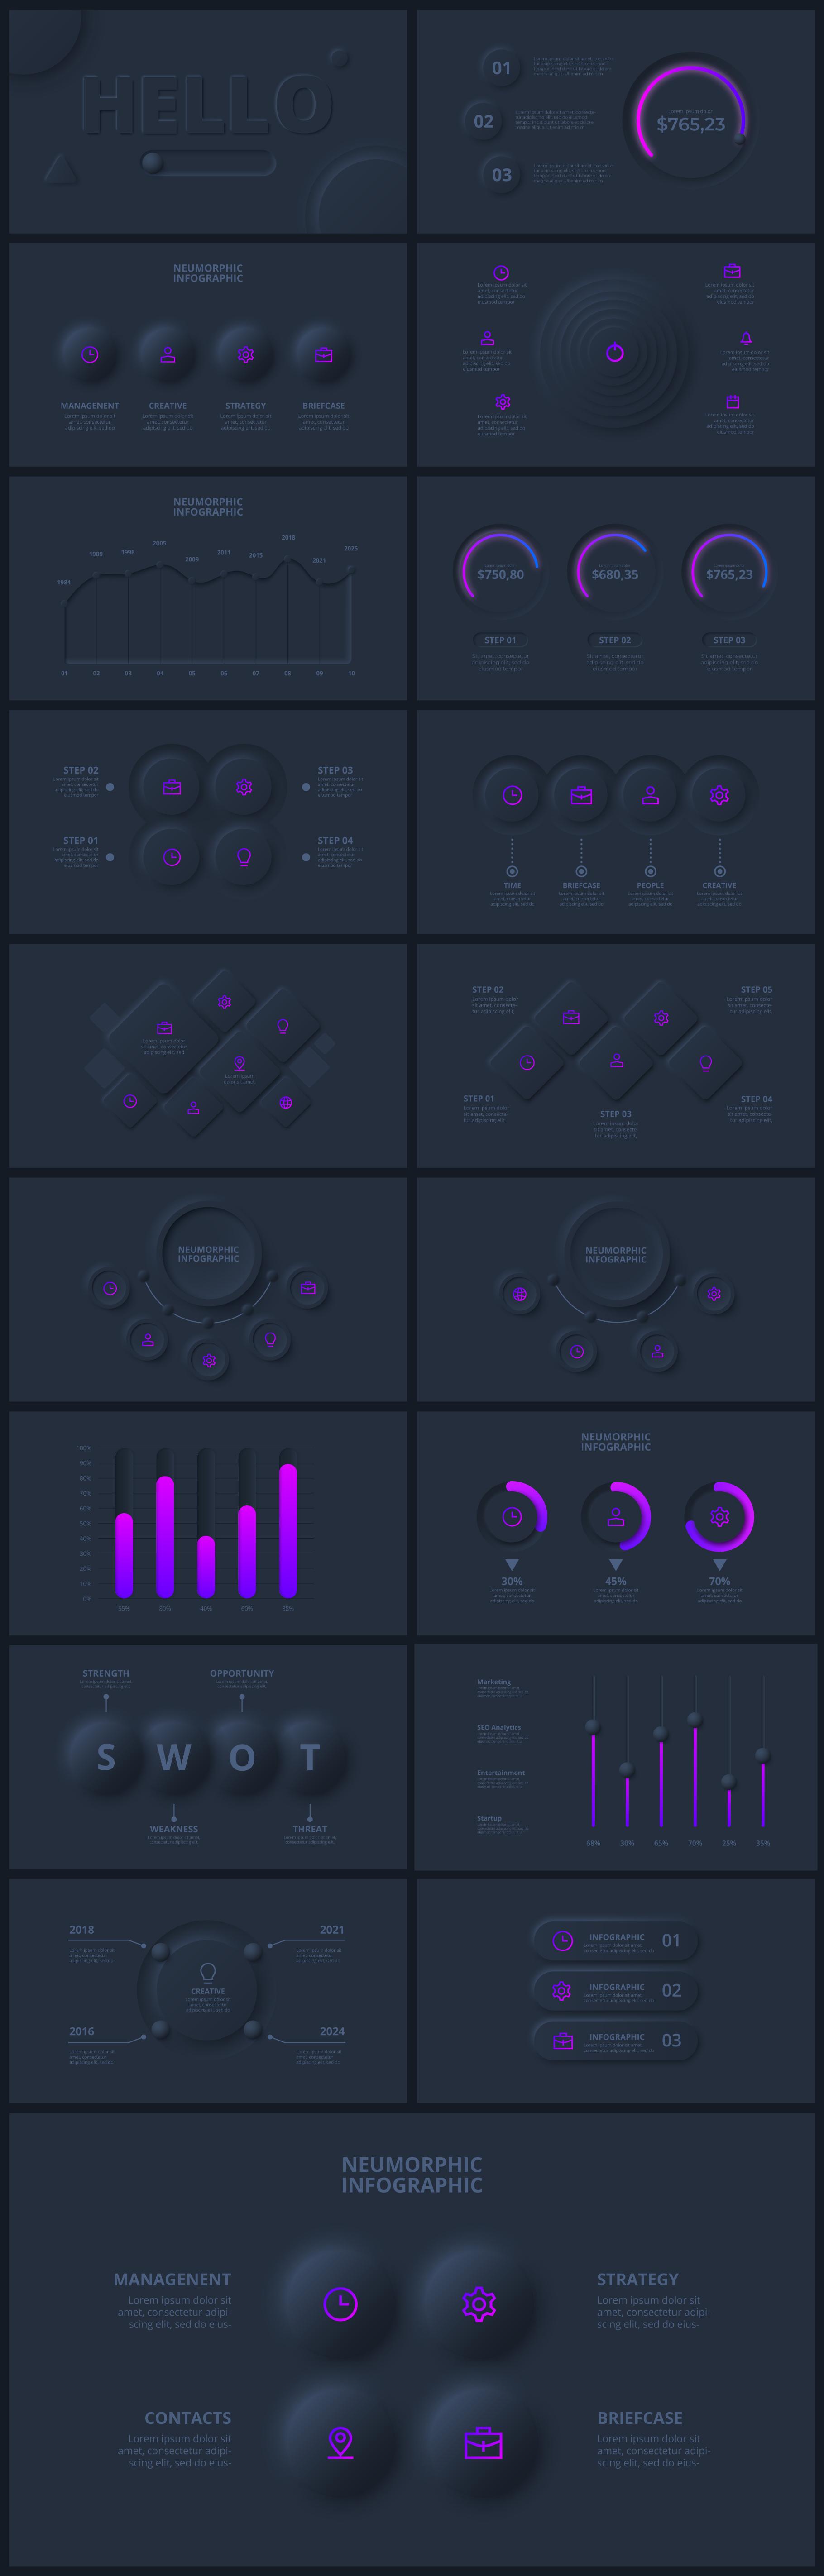 Multipurpose Infographics PowerPoint Templates v.5.0 - 62